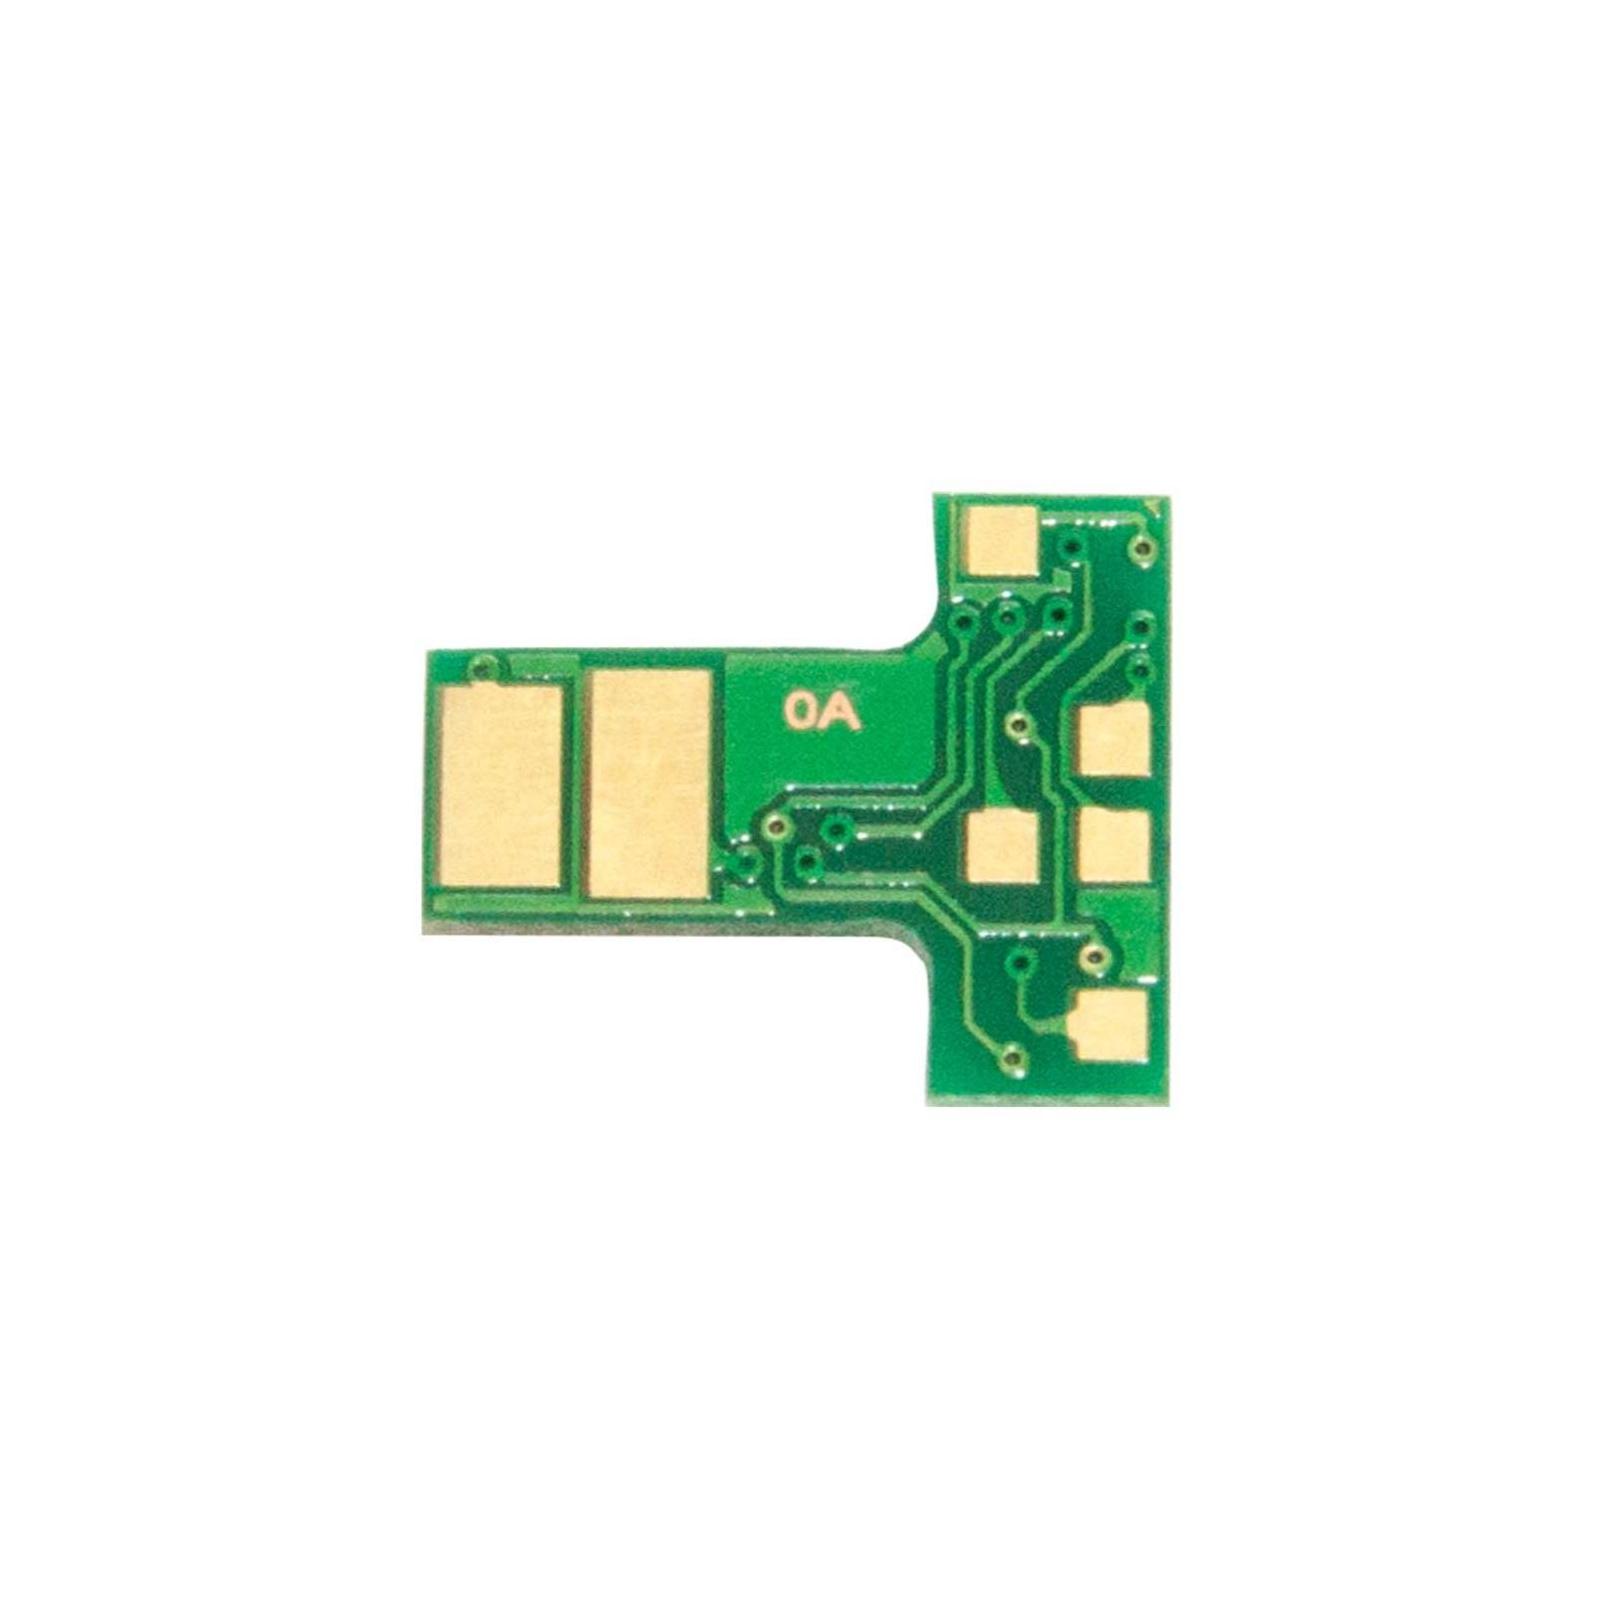 Чип для картриджа HP LJ Pro M203/M227, 3.5К BASF (CH-CF230X) изображение 2